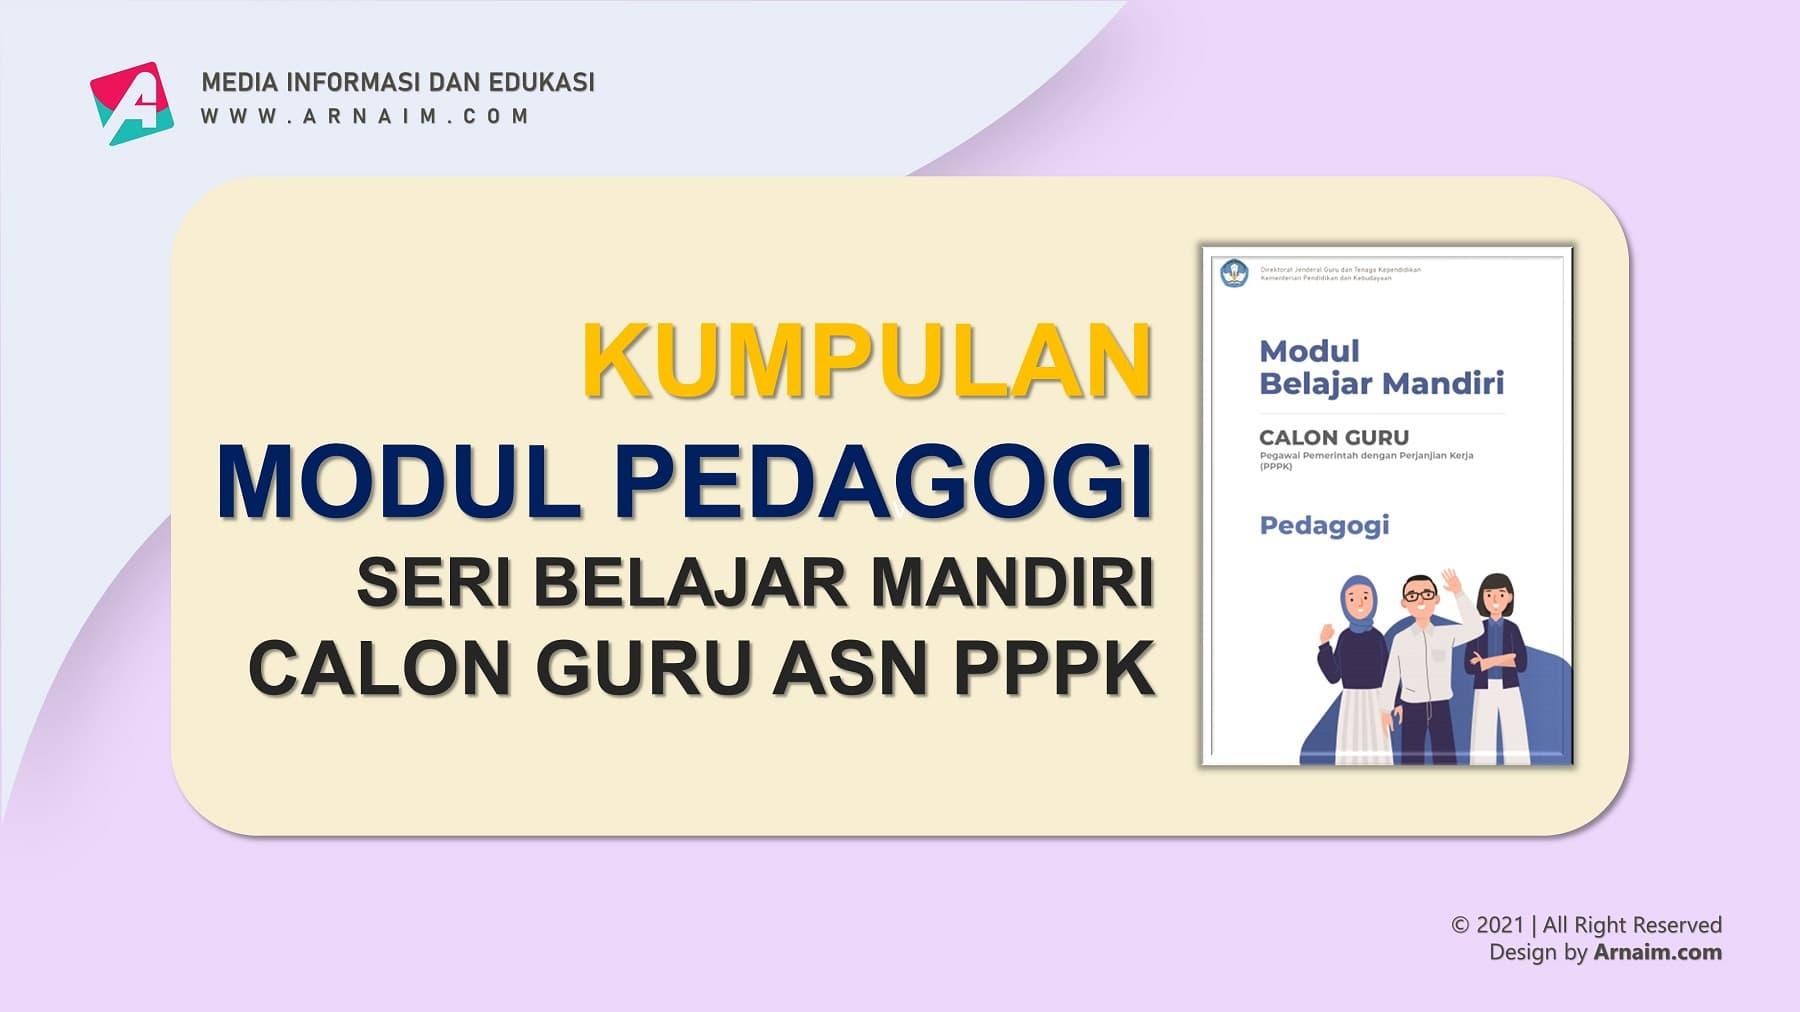 Arnaim.Com - Kumpulan Modul Pedagogi Seri Belajar Mandiri Calon Guru ASN PPPK